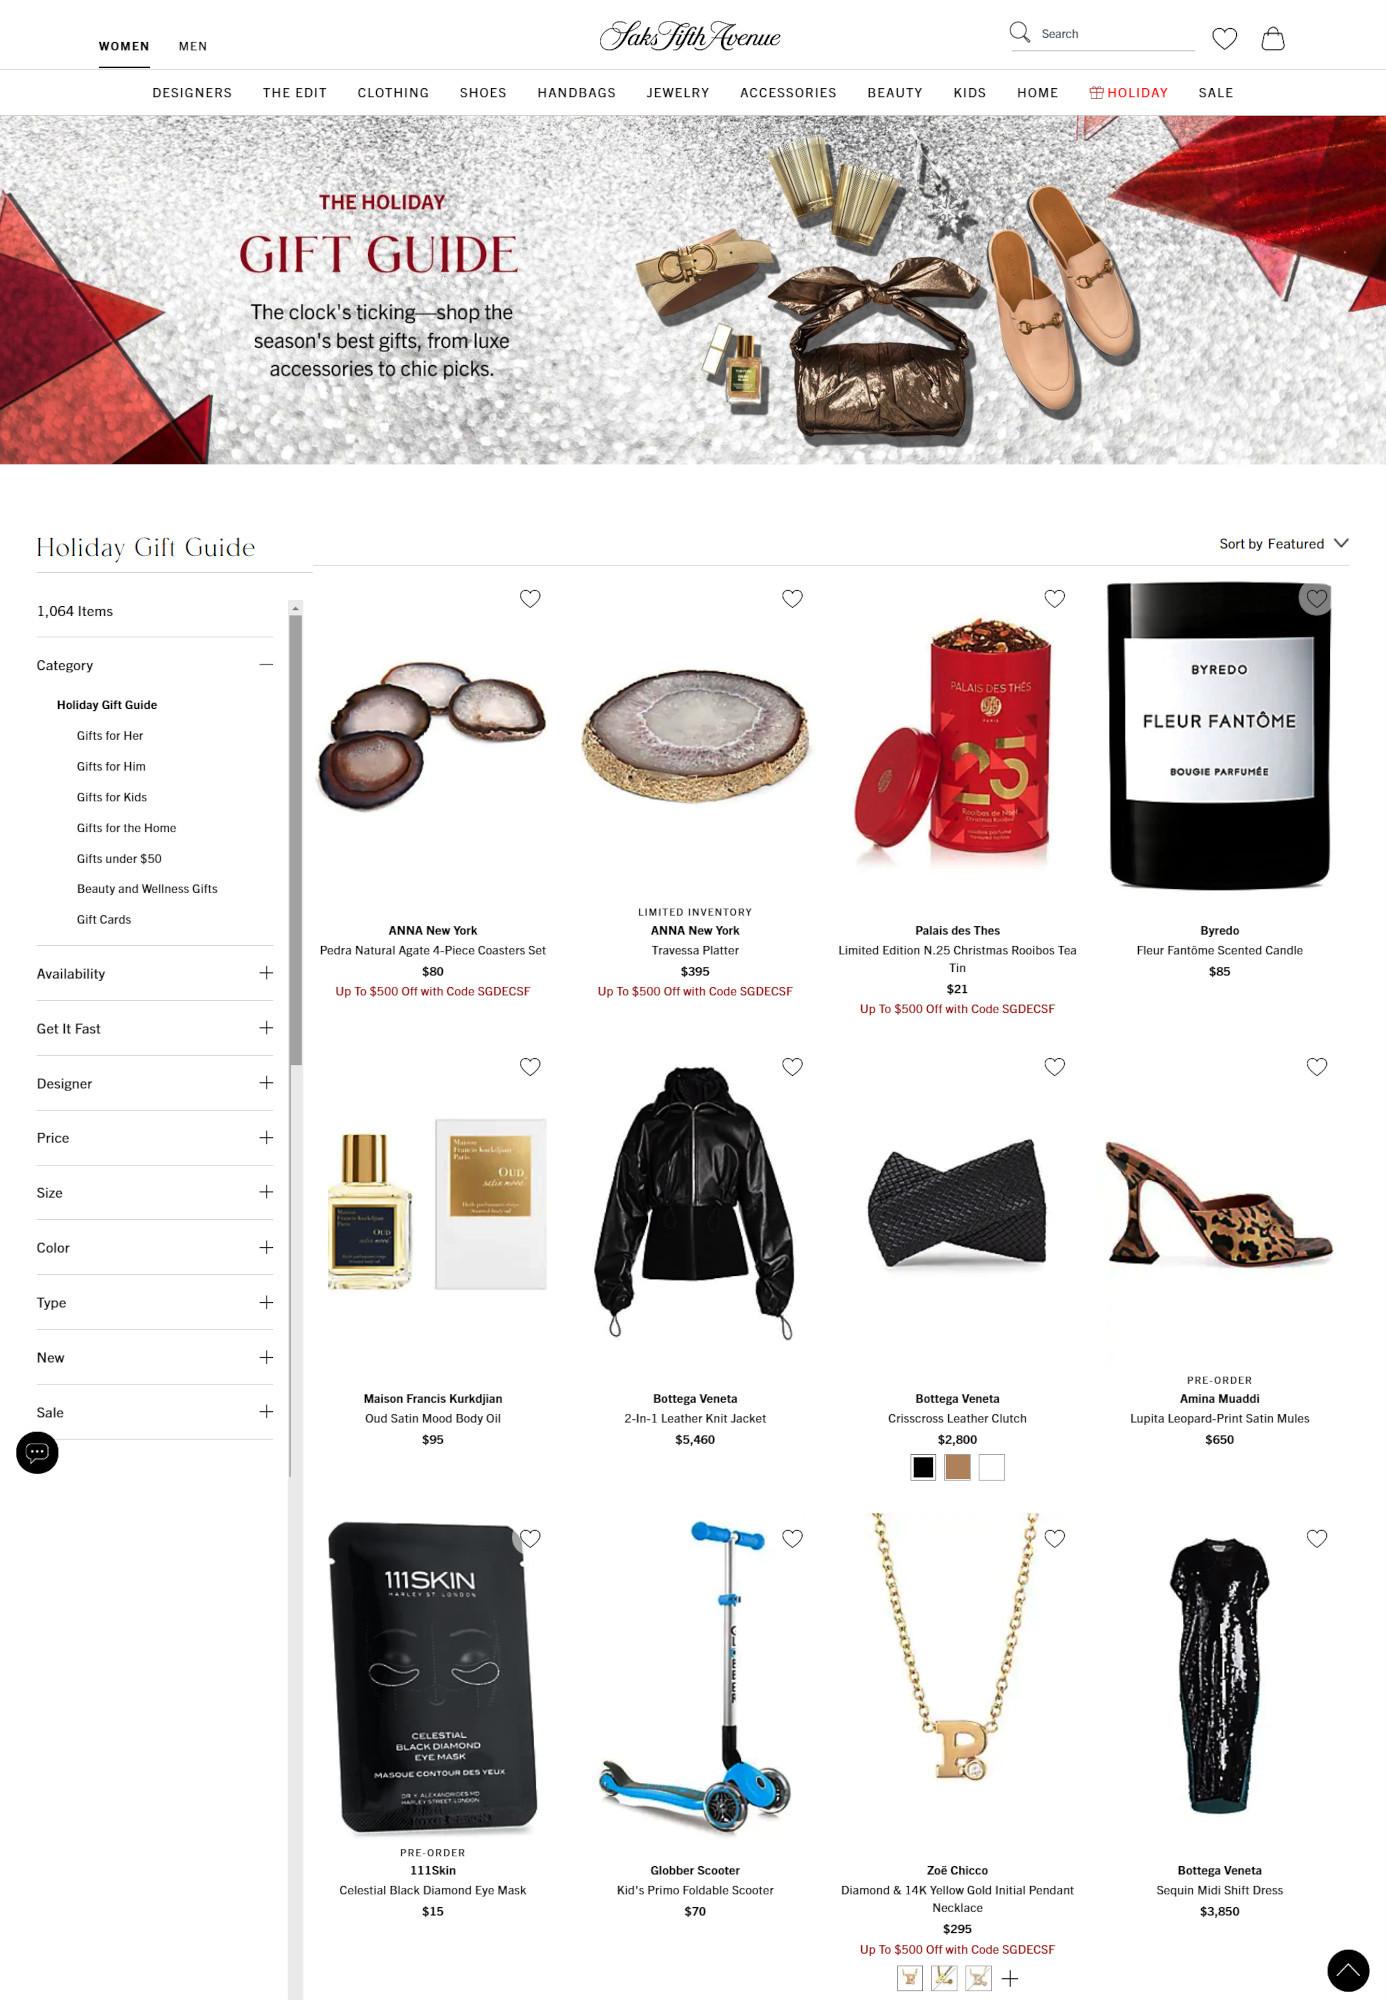 Saks Fifth AvenueとMastercardによるバーチャル・ホリデー・ショップ、Saks Holiday Shopオープン中_b0007805_03241490.jpg